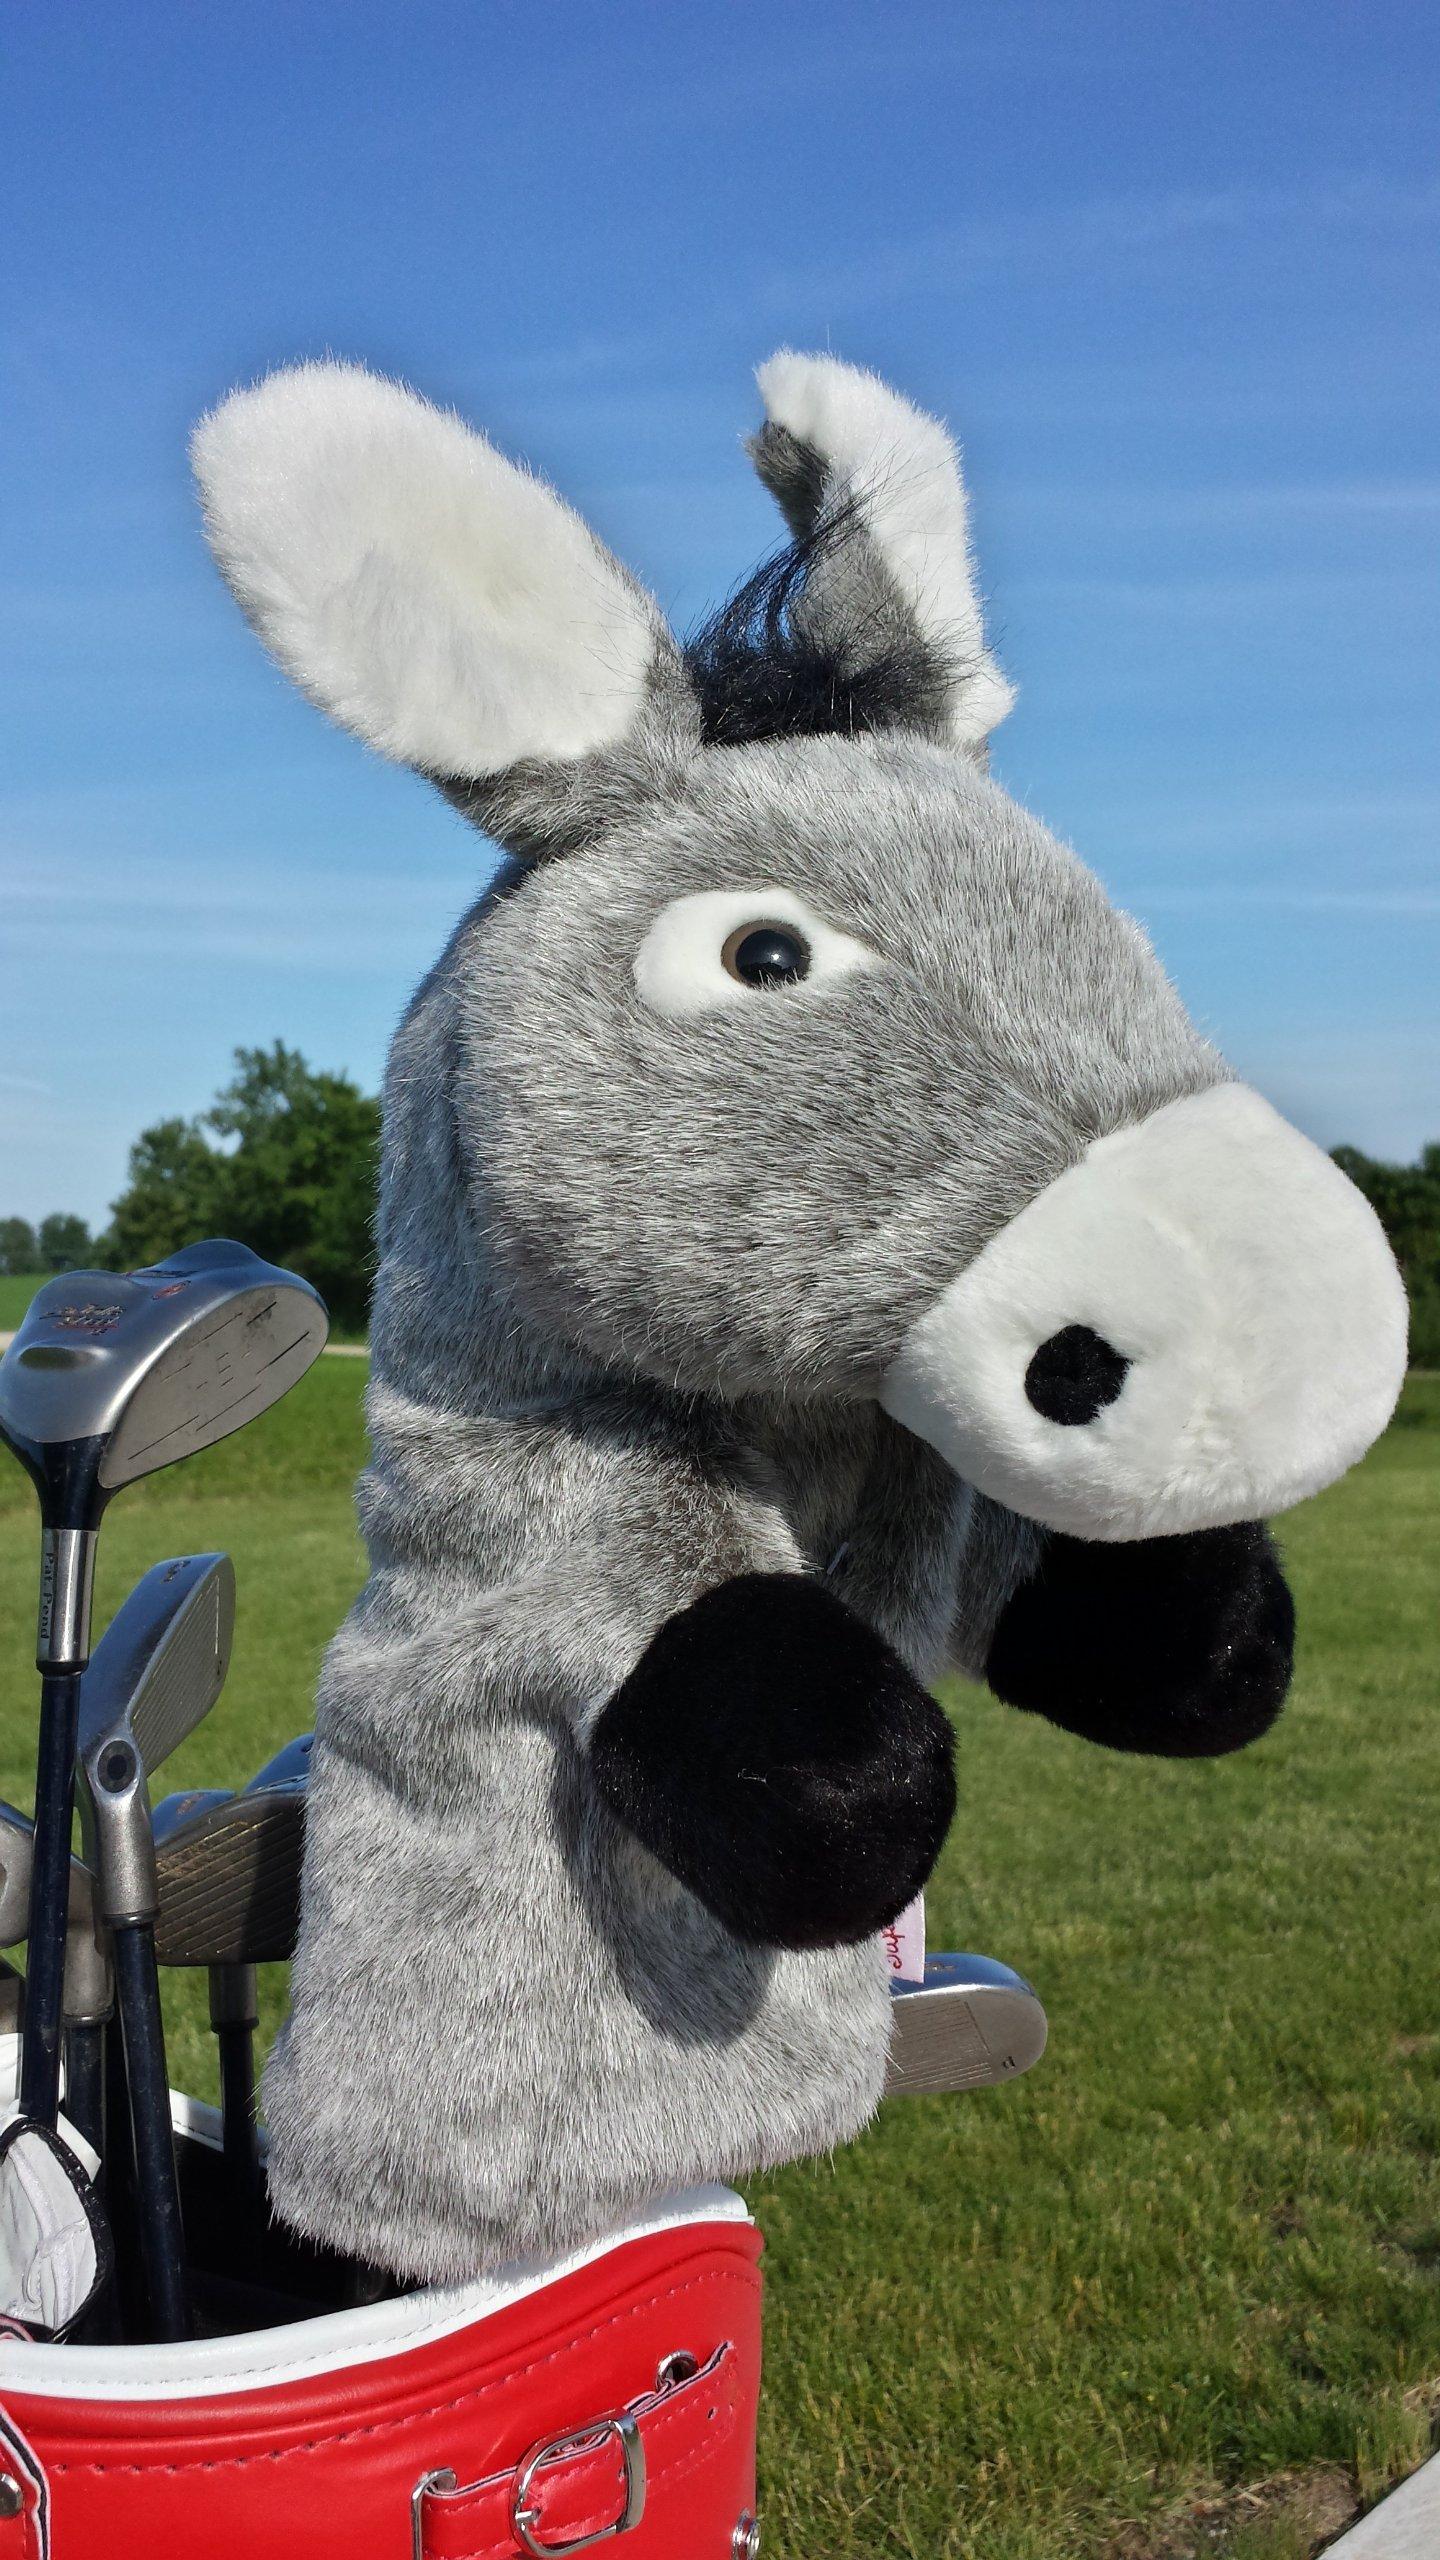 Oversized Eeyore Shrek Donkey Head Cover Golf